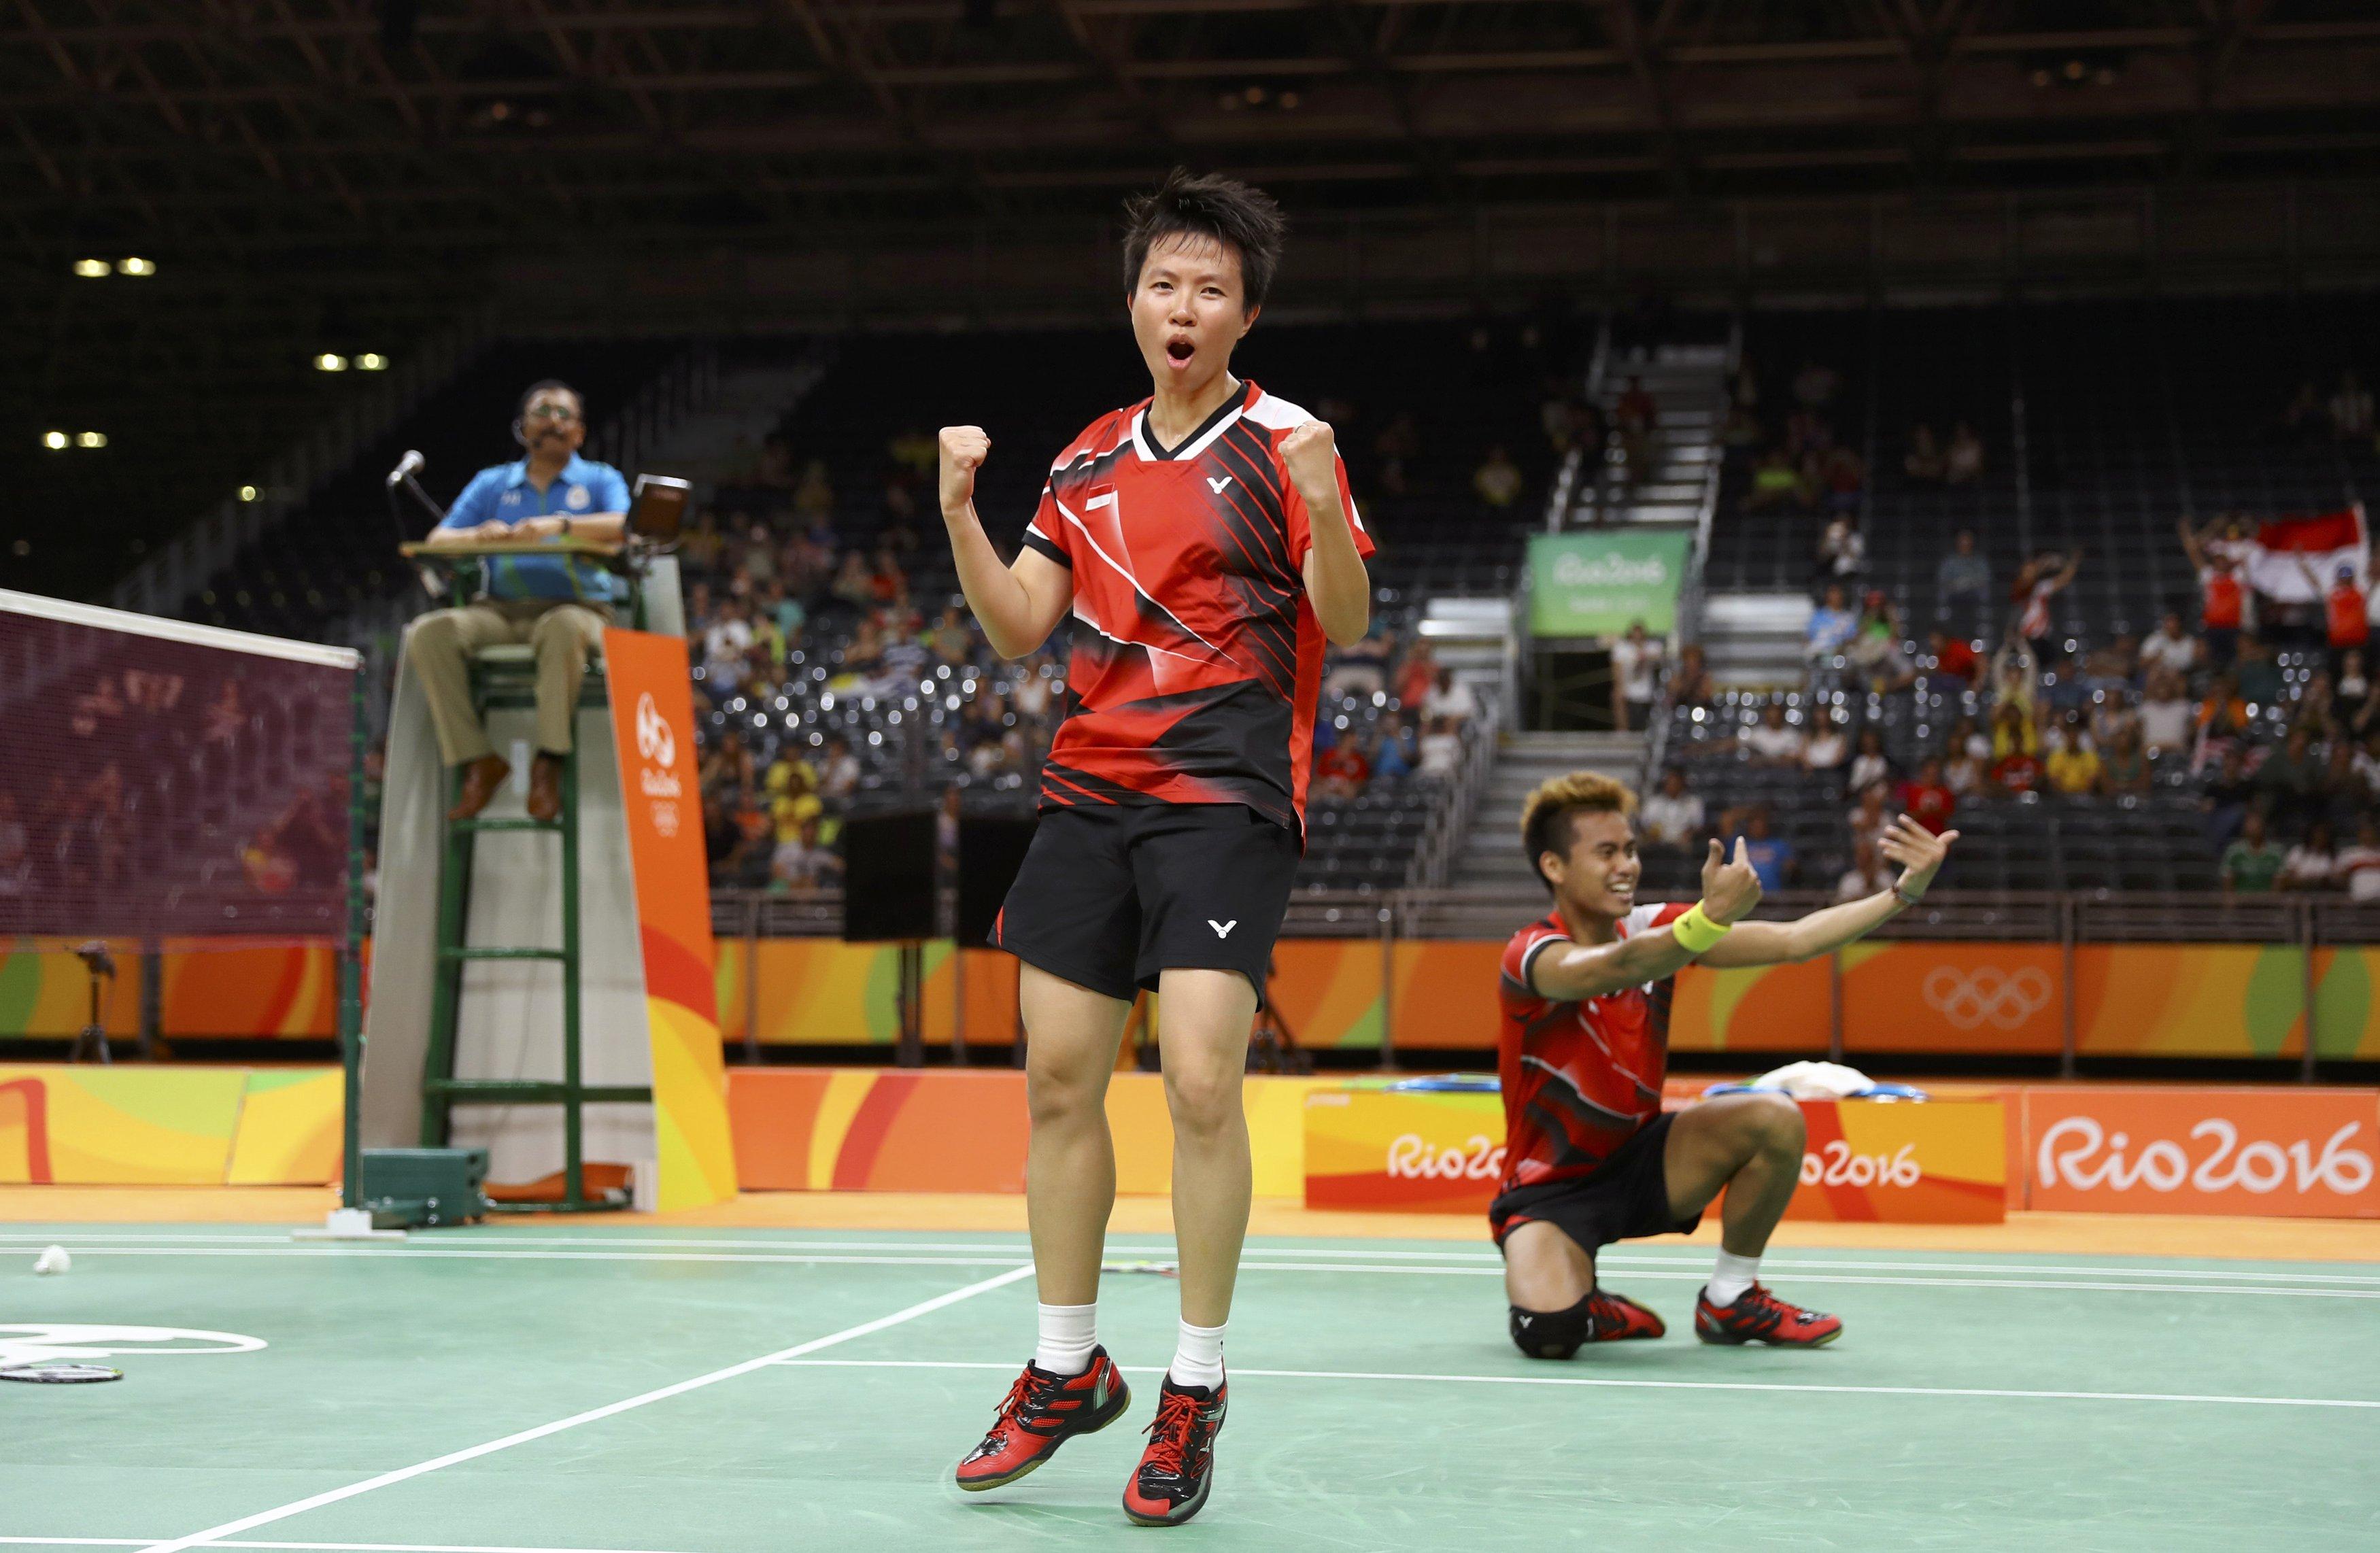 SAKSIKAN Liliyana Natsir ingin juarai Indonesia Open bersama